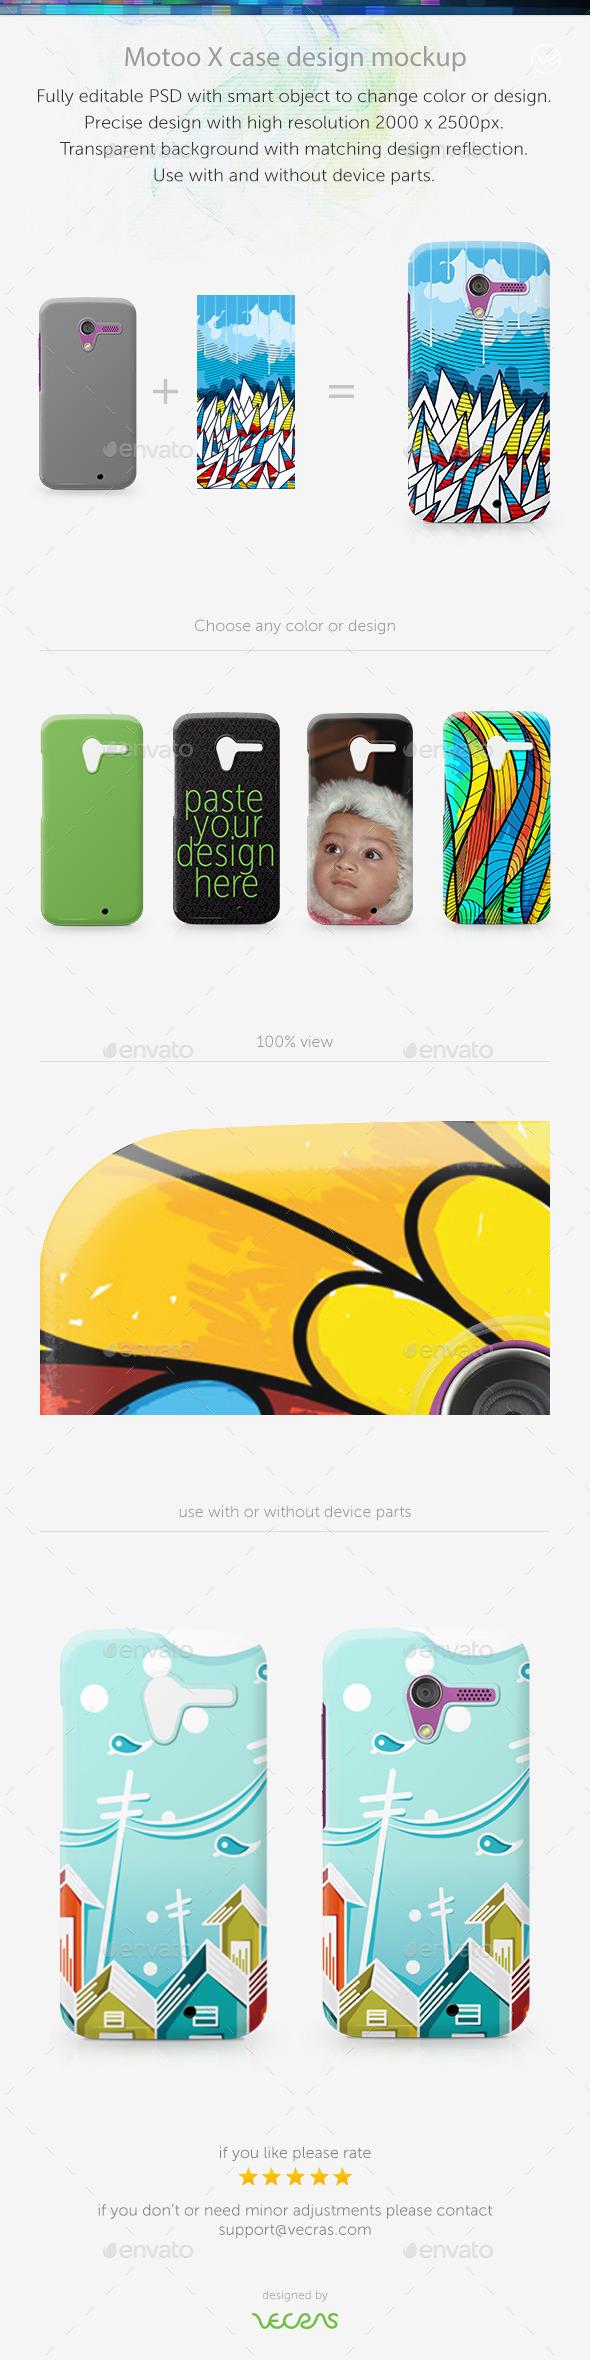 Motoo X Case Design Mockup